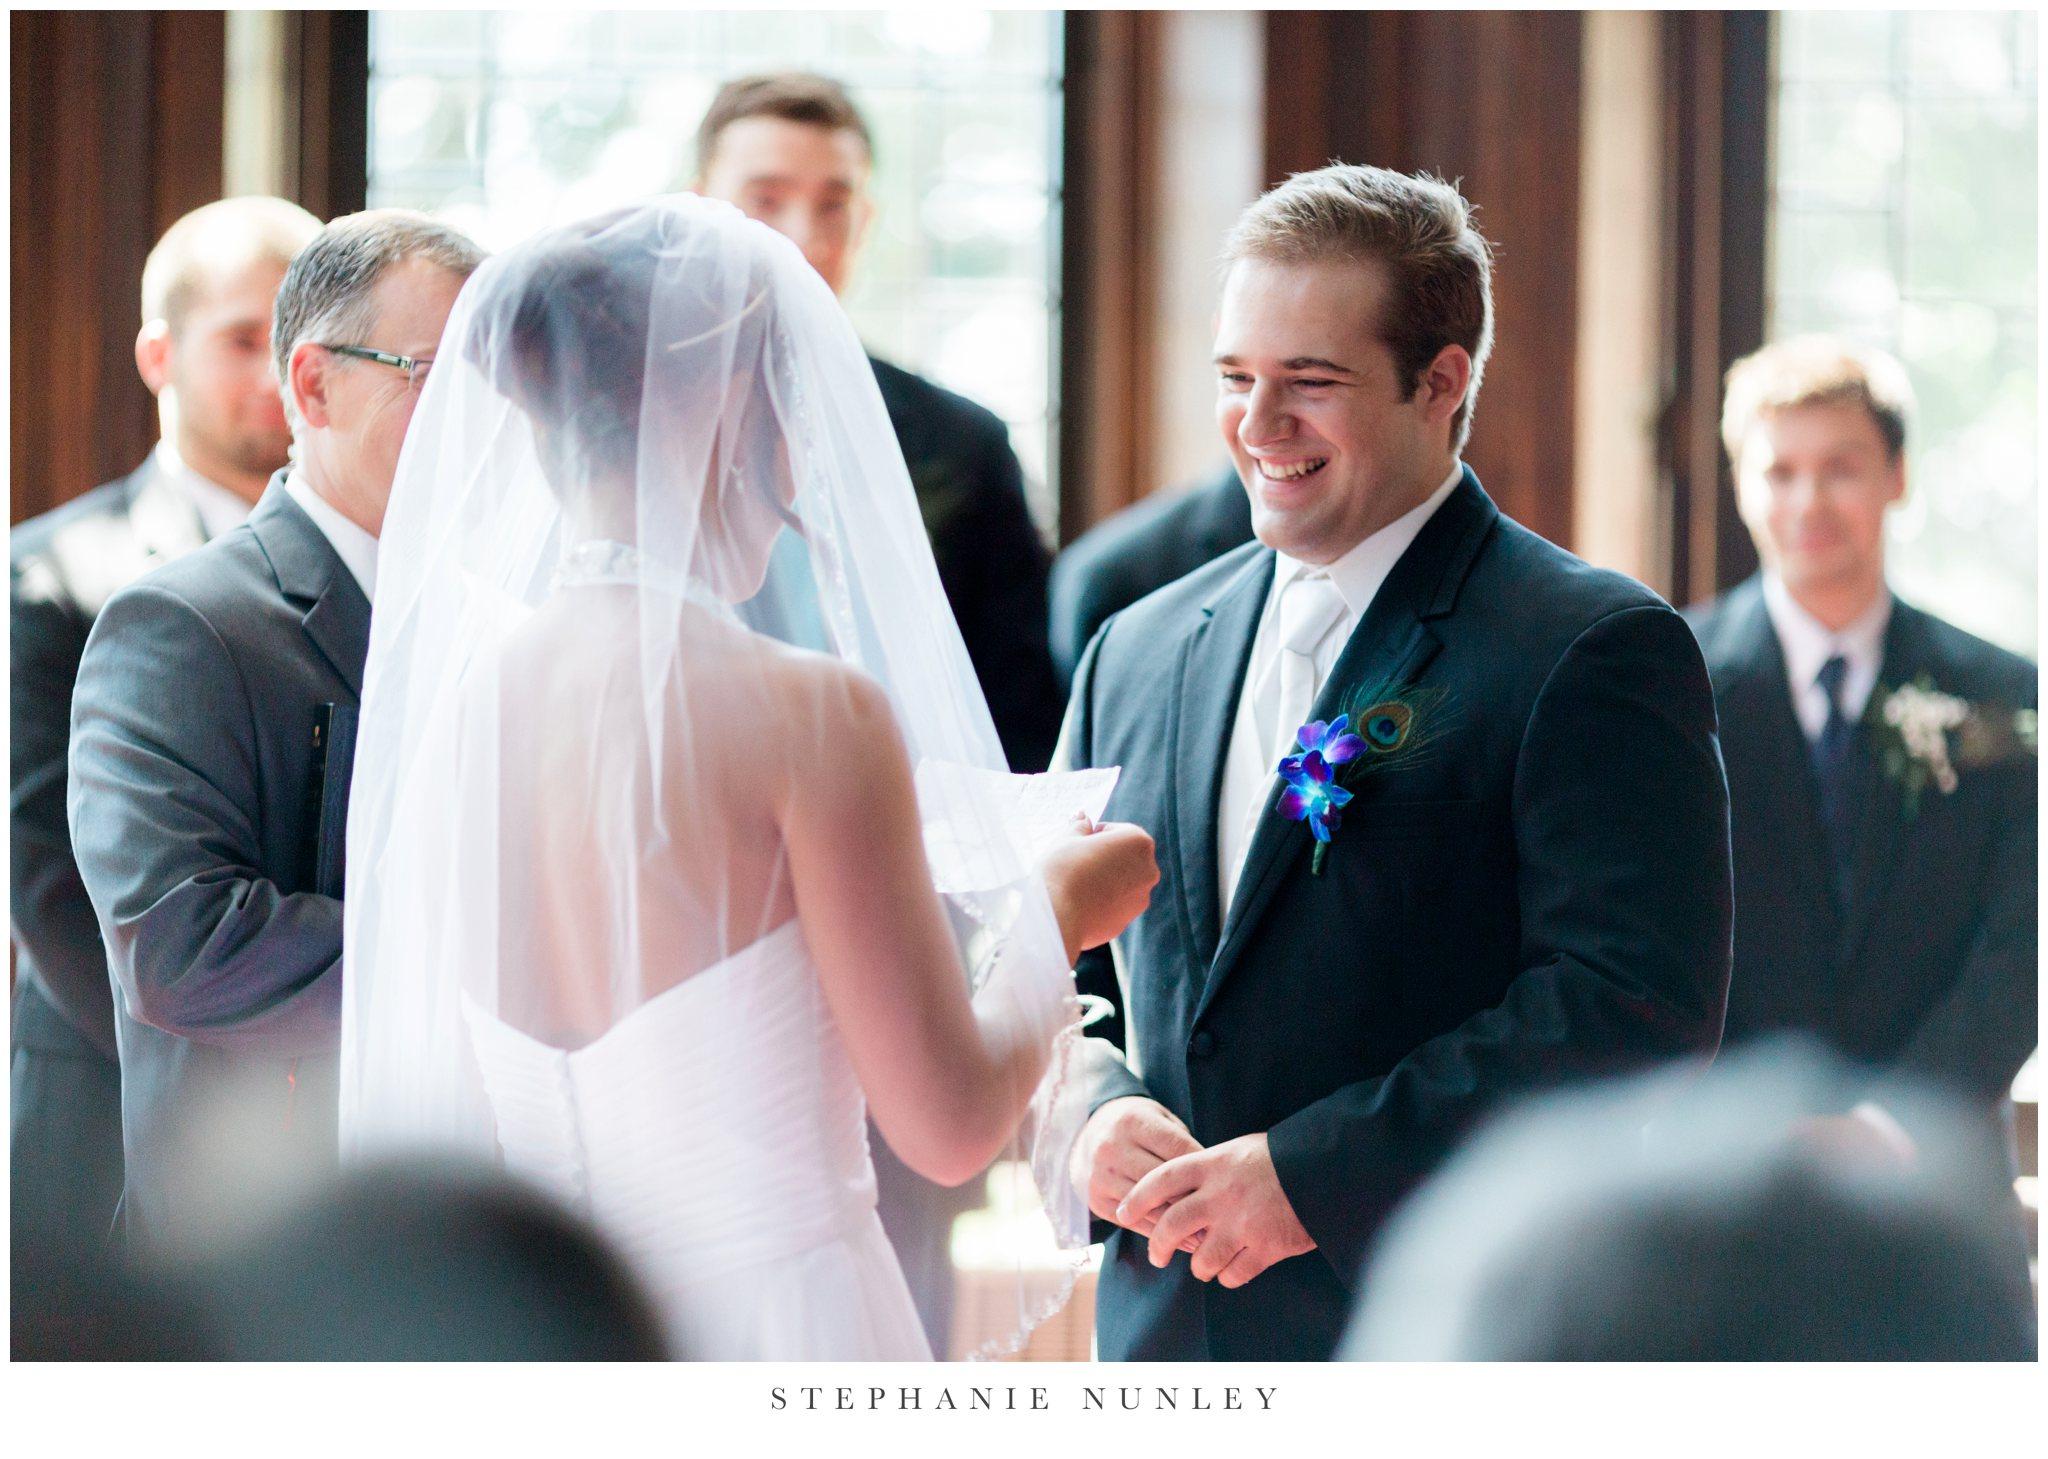 fine-art-destination-wedding-photographer-0025.jpg